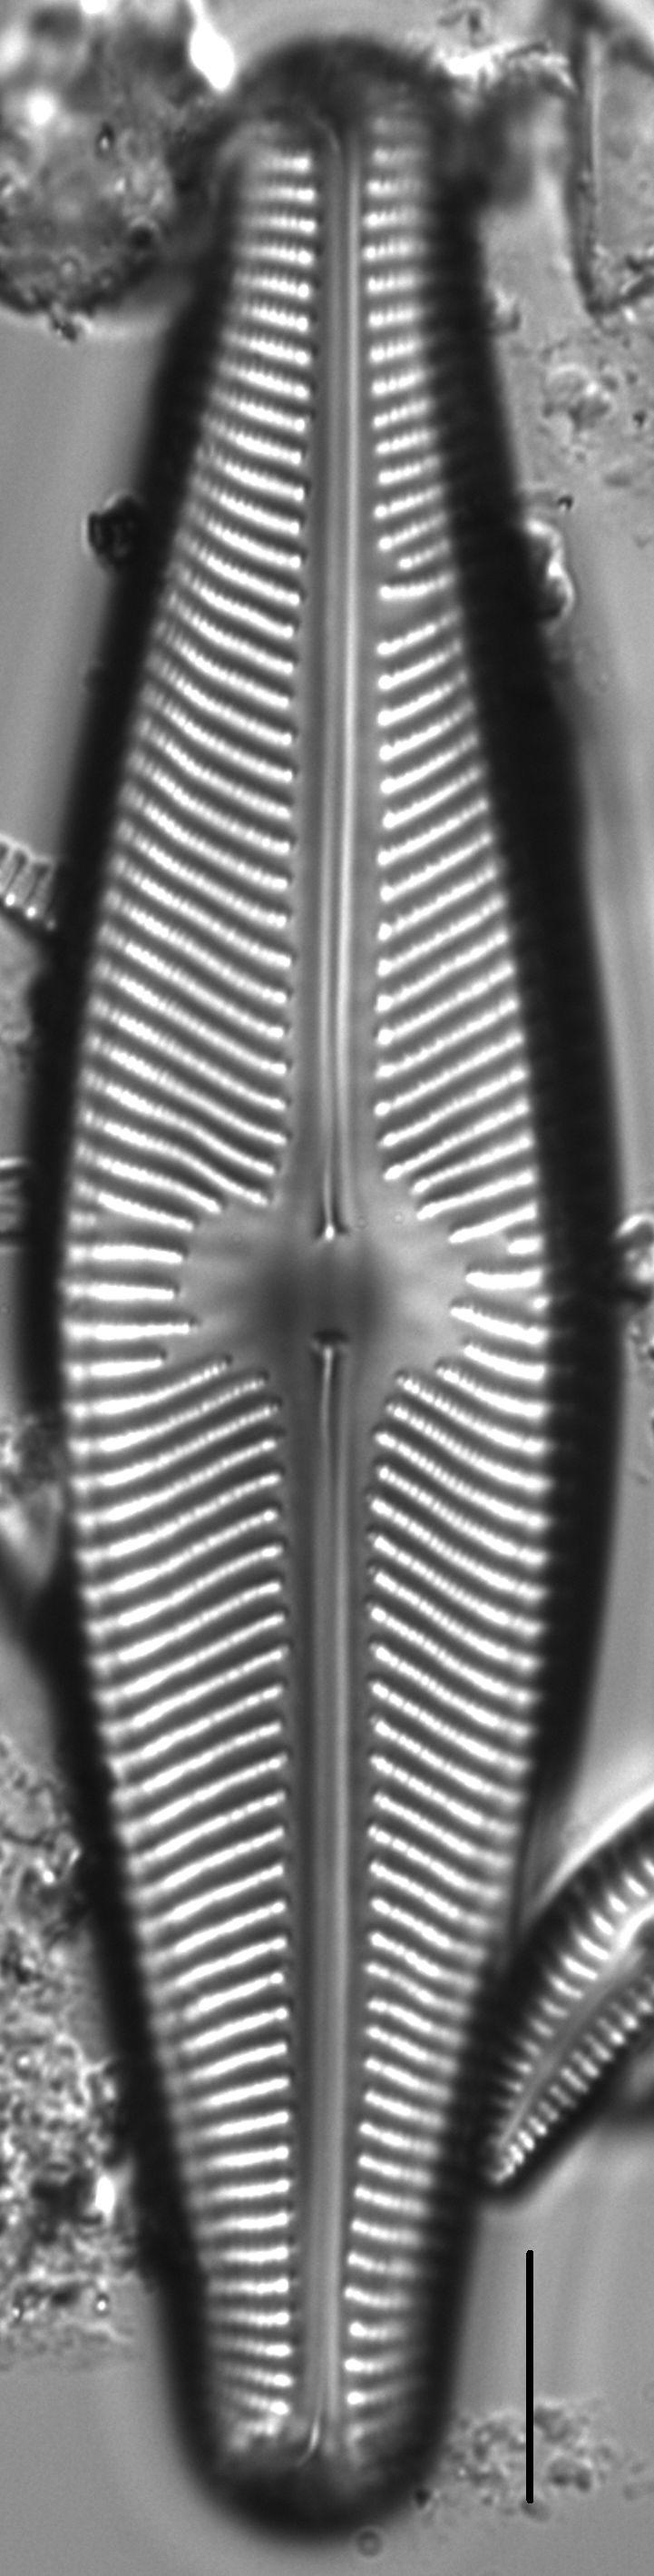 Navicula aurora LM4